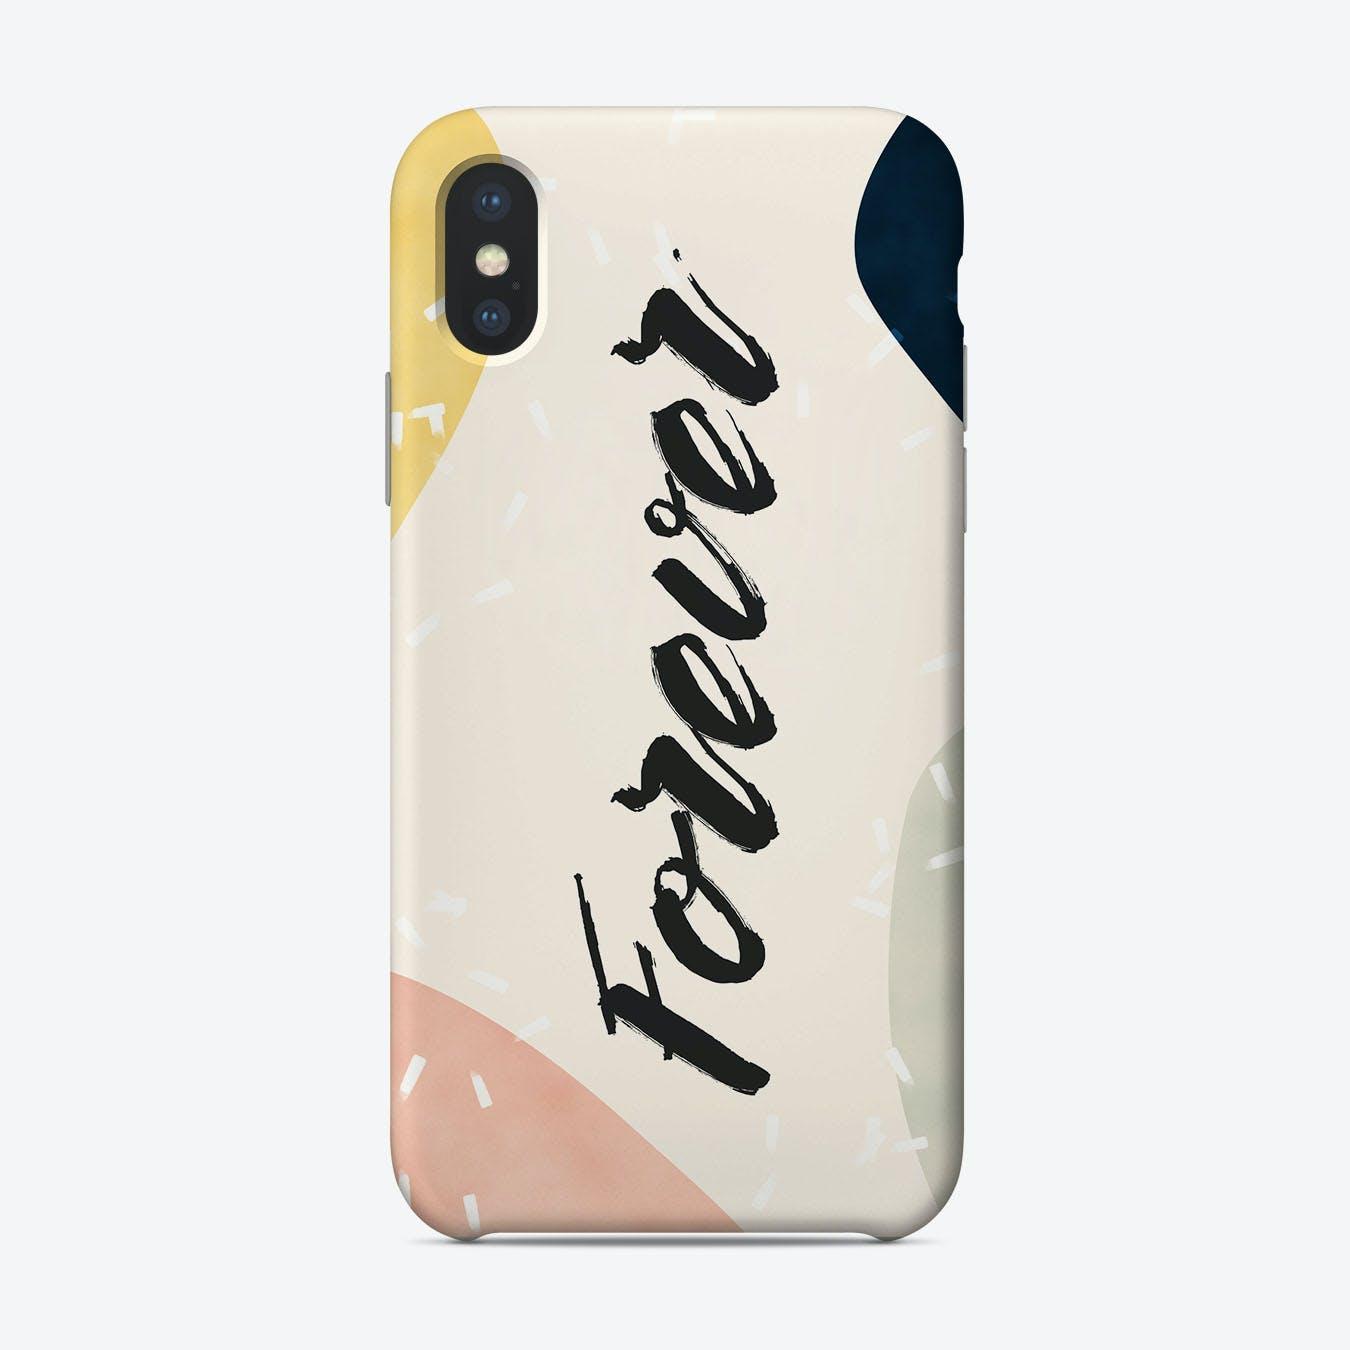 Forever Phone Case